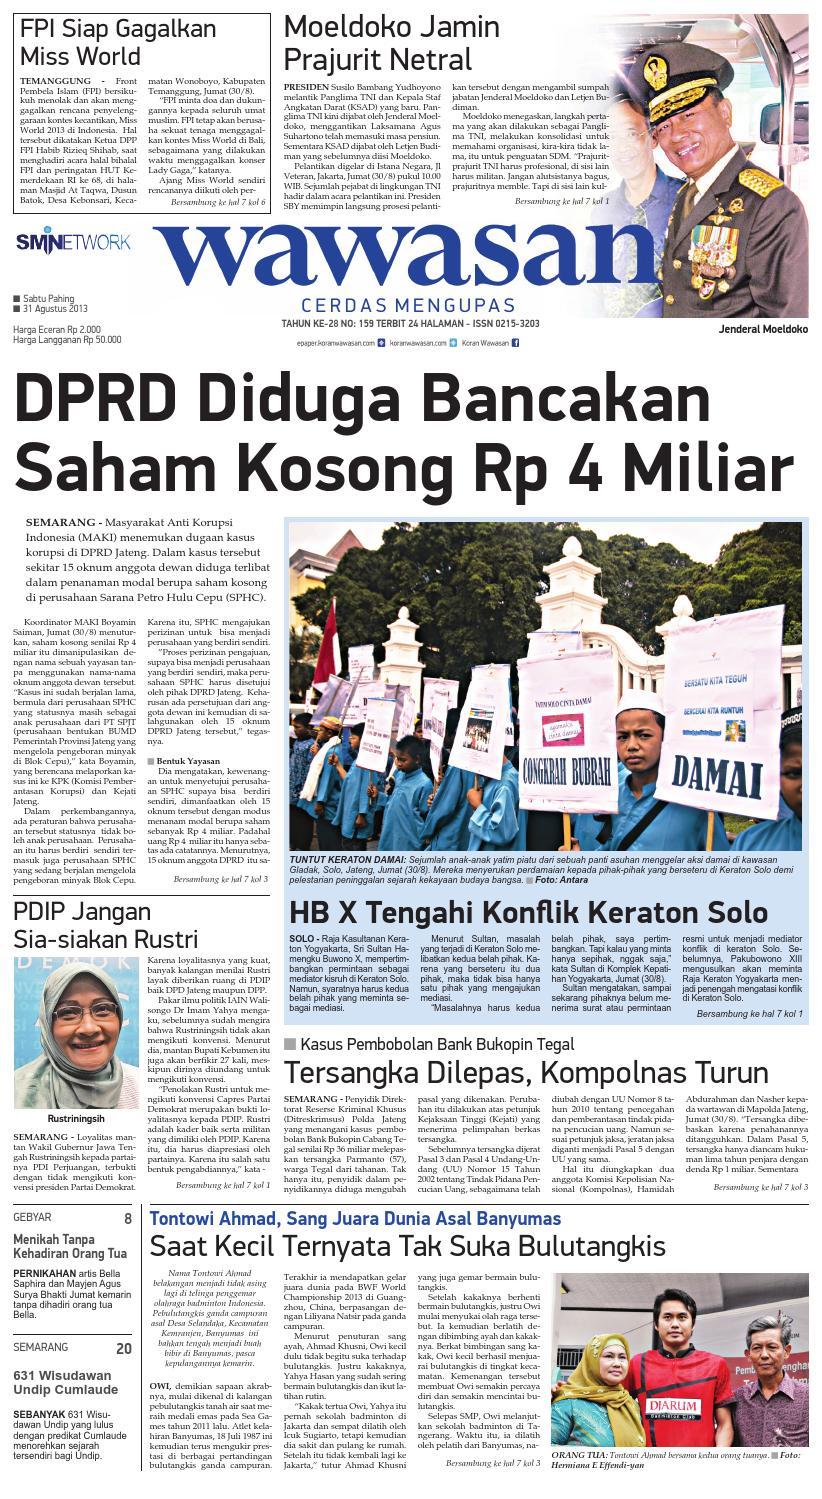 Wawasan 31 Agustus 2013 By Koran Pagi Issuu Produk Ukm Bumn Batik Tulis Babon Angrem